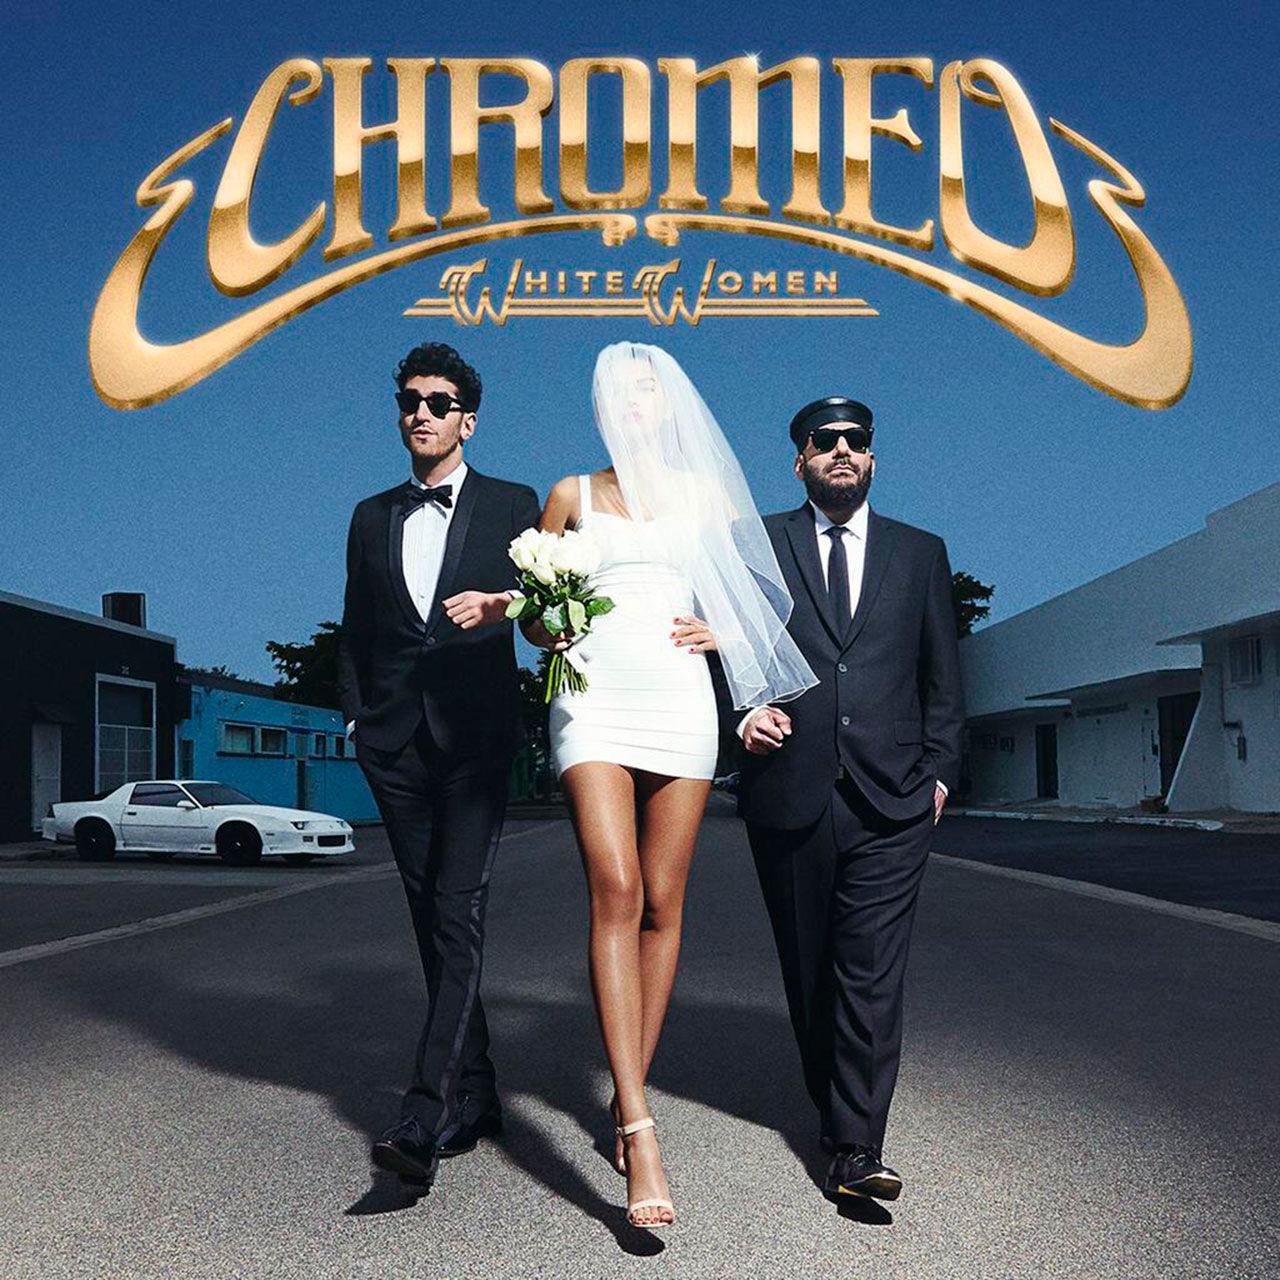 Streama Chromeos nya album